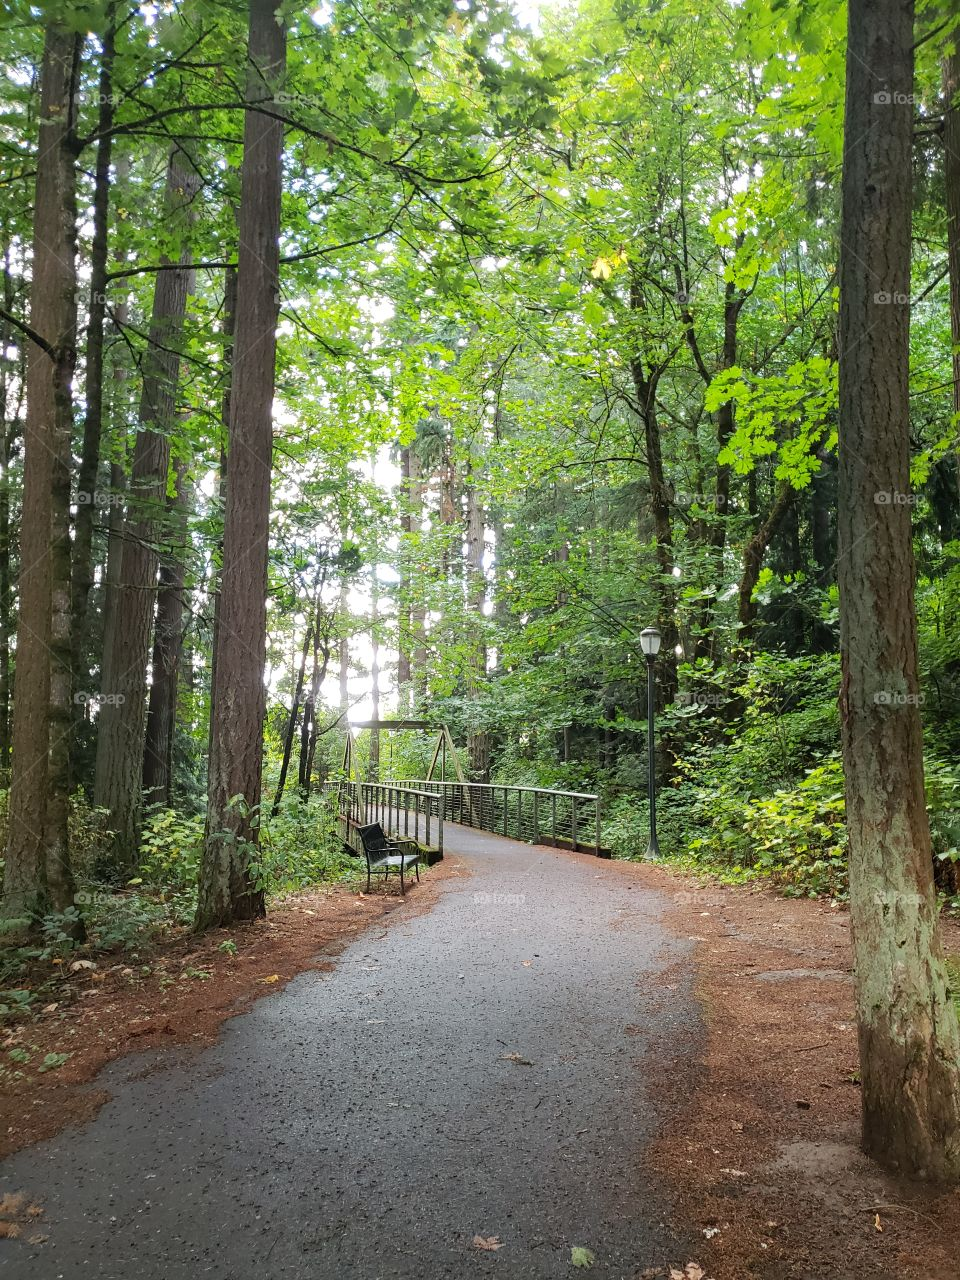 Bridge on forest path